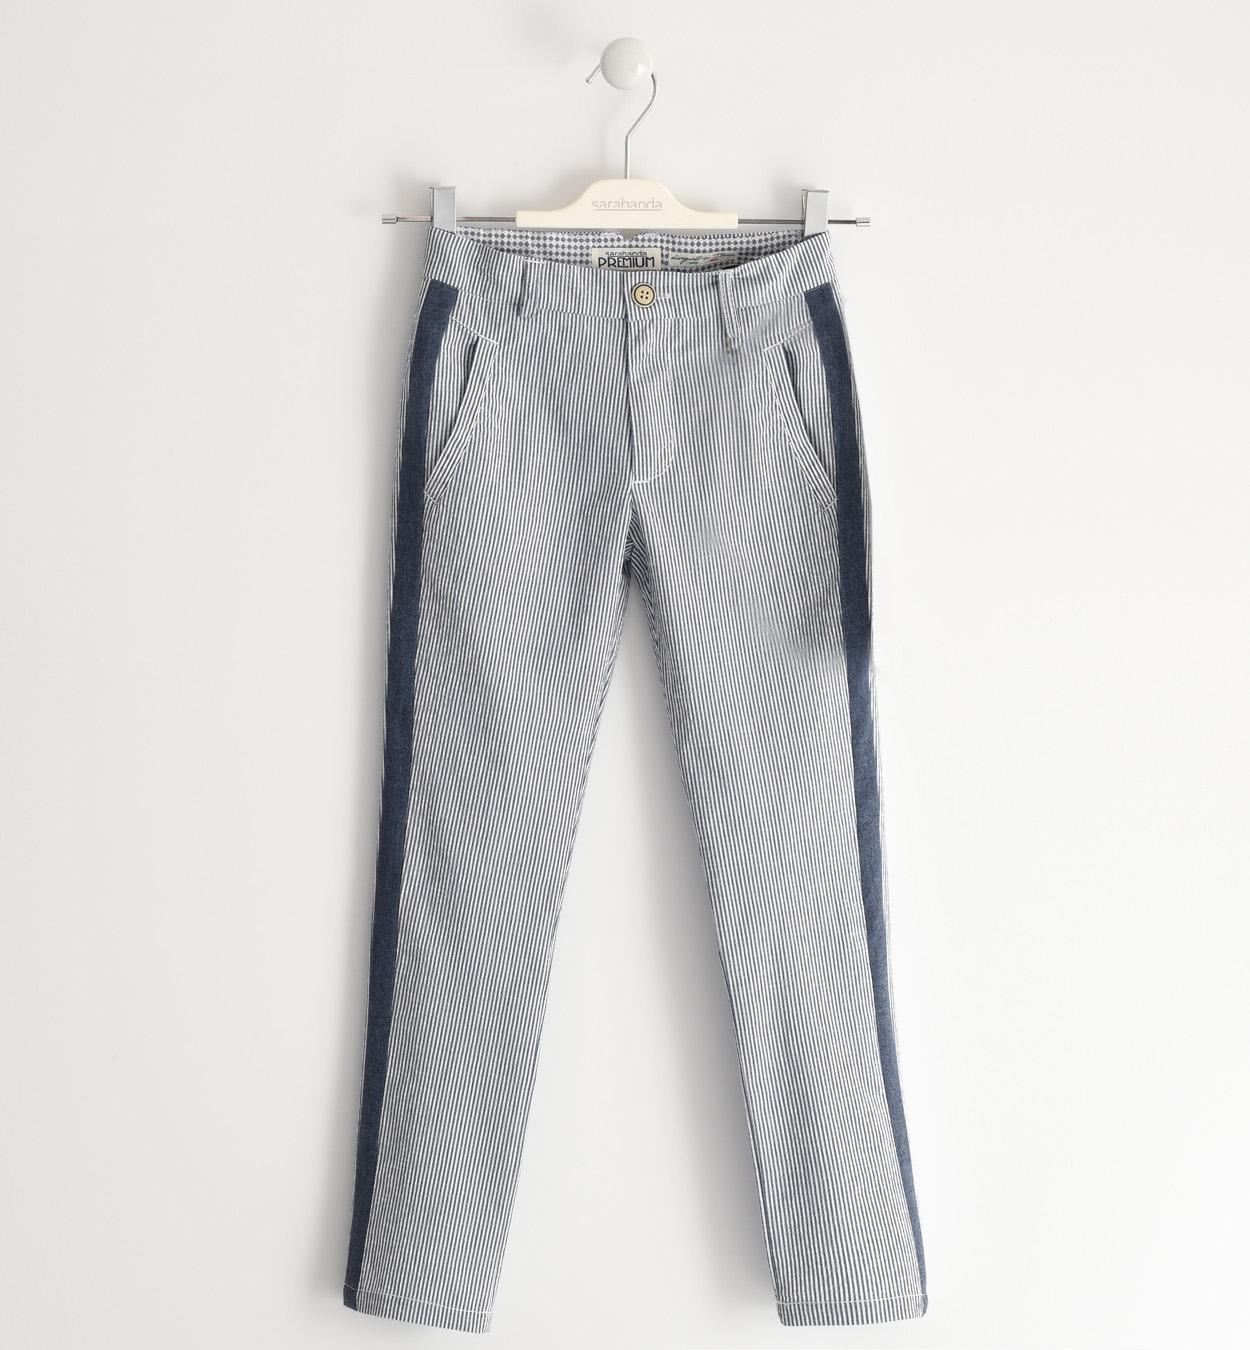 Sarabanda fiú csíkos kék öltöny nadrág